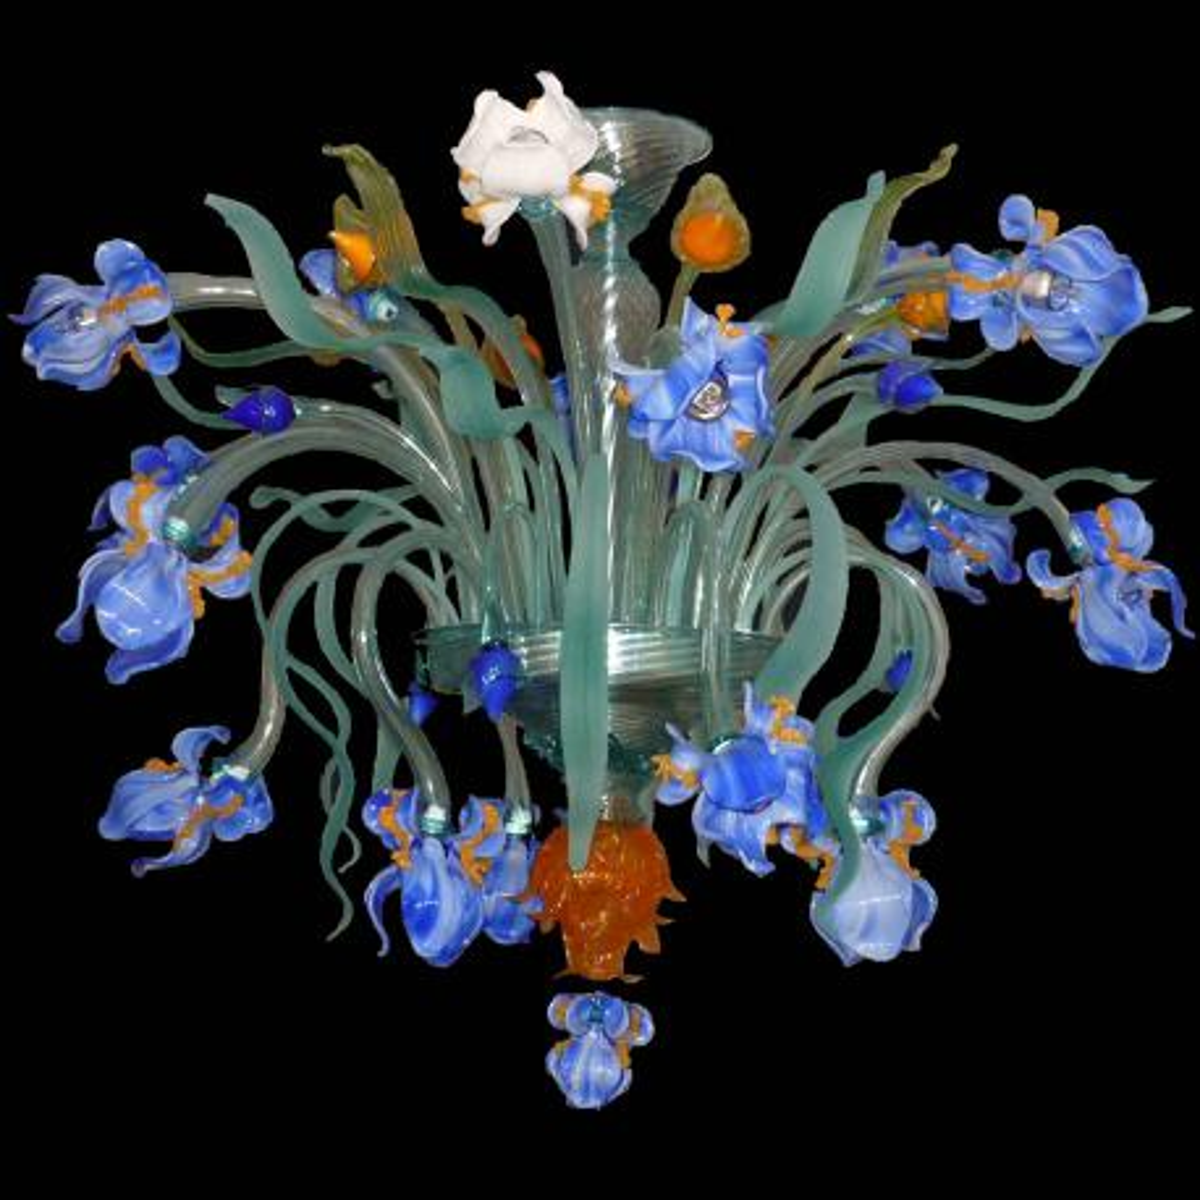 """Iris di Luce"" Murano glass ceiling light - 16 lights - blue"